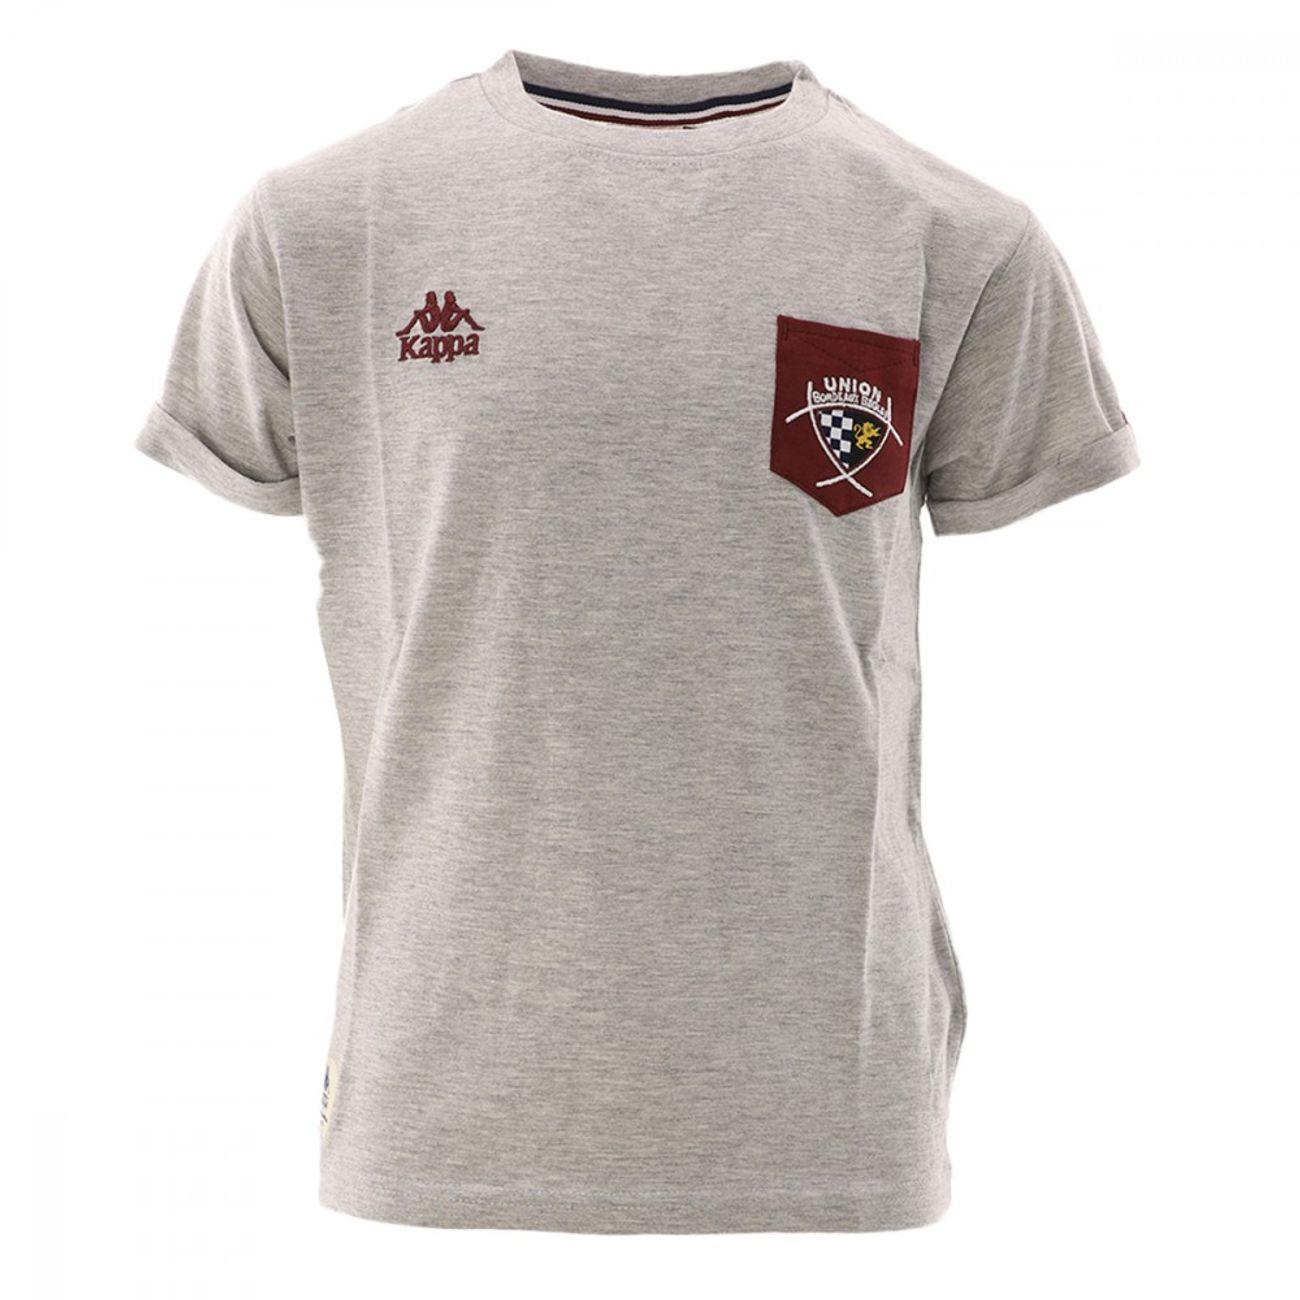 Mode- Lifestyle homme KAPPA Union bordeaux bègles T-Shirt Rugby Gris Garçon Kappa